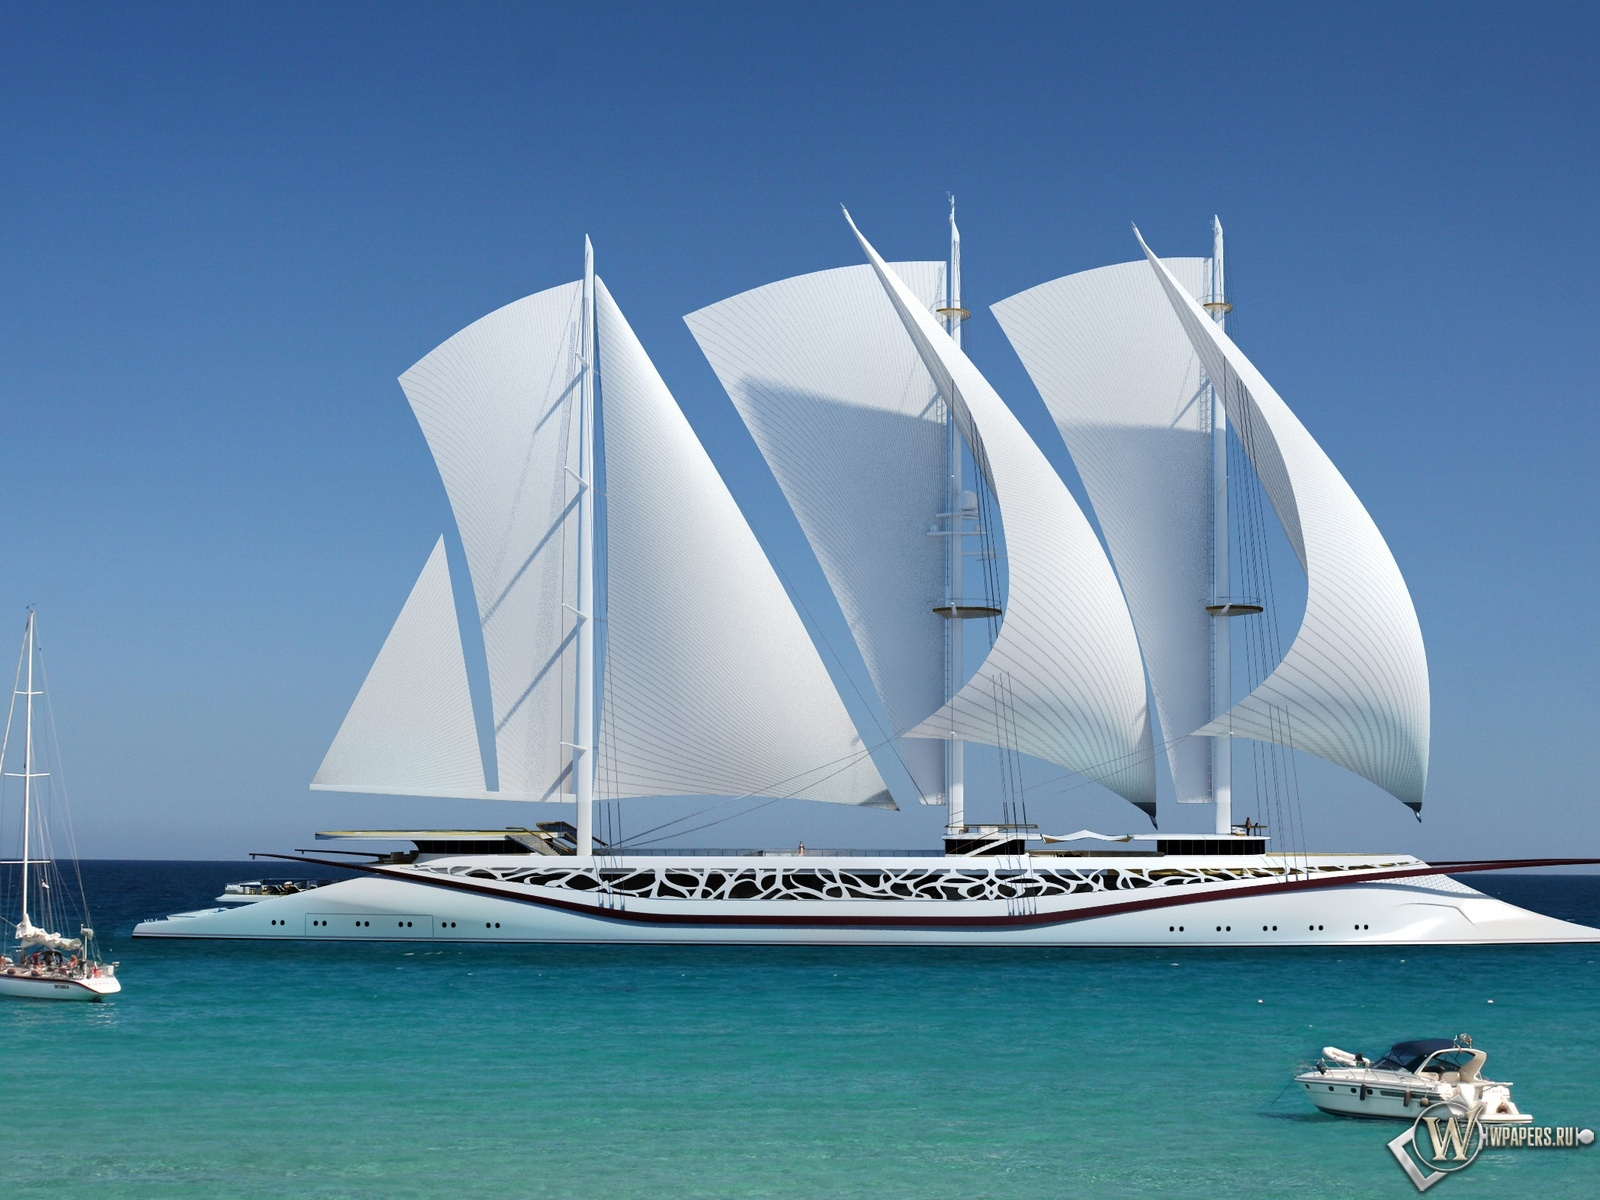 Судно море яхта 1600x1200 картинки